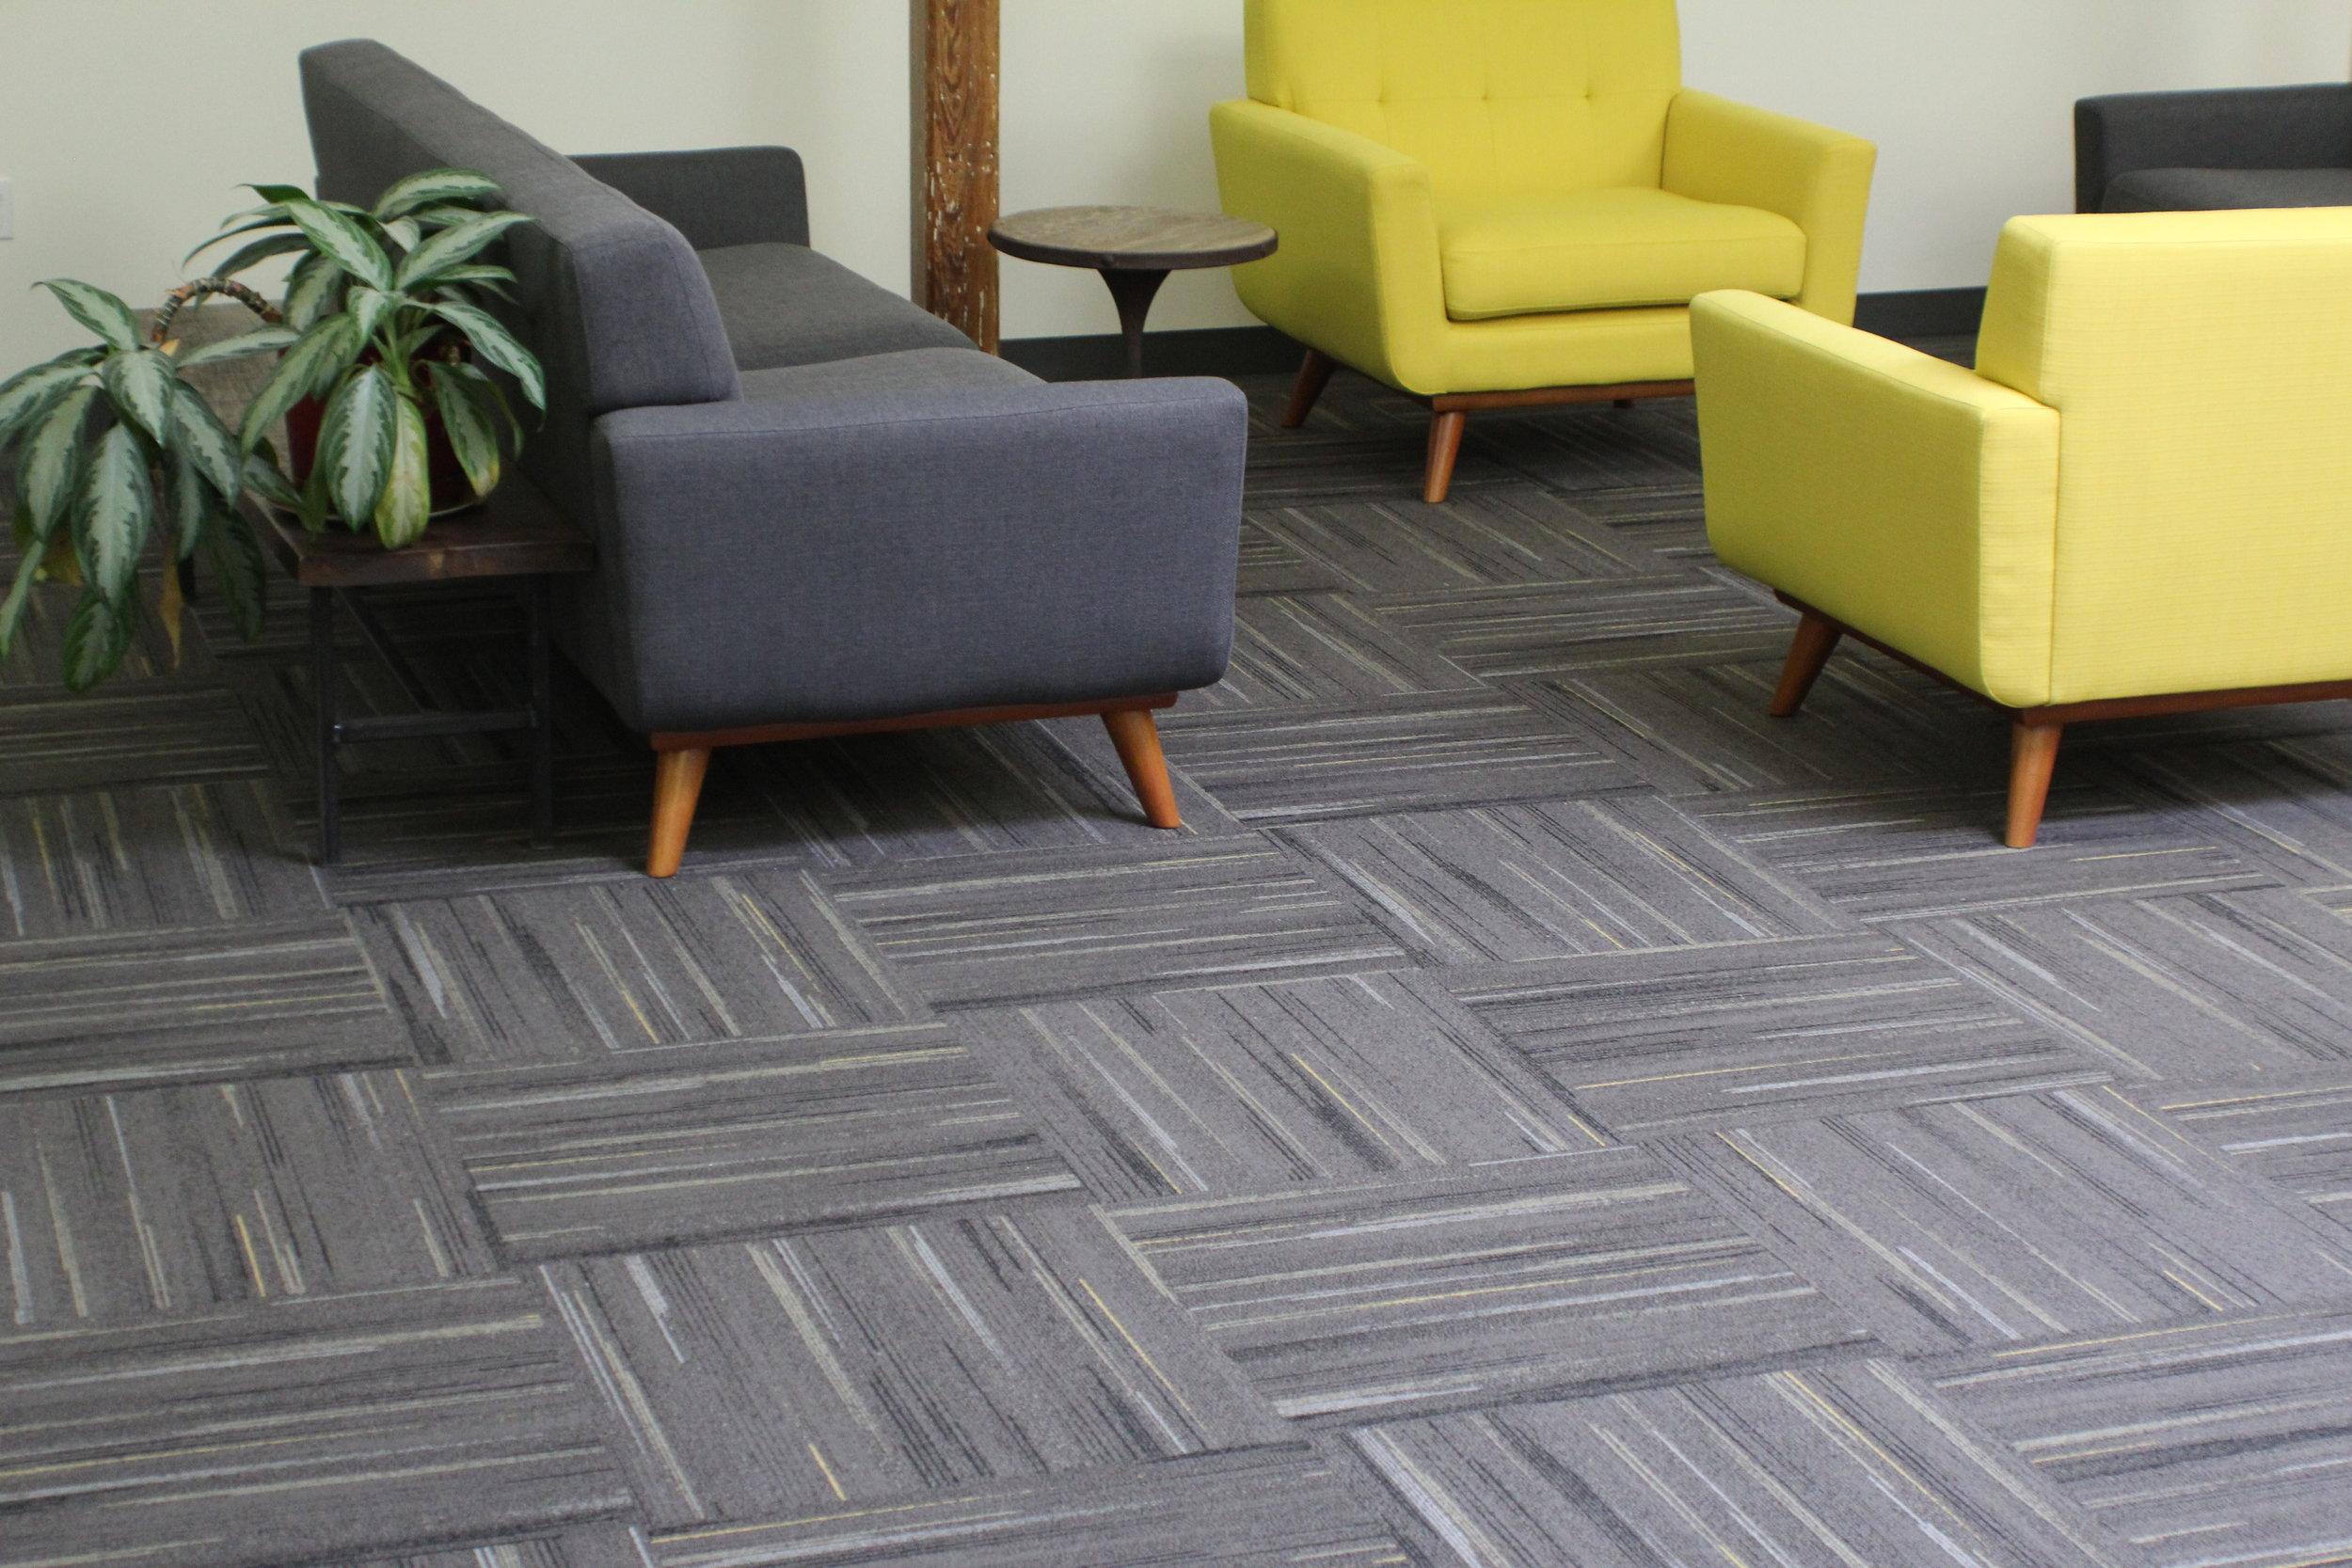 Ebsco Publishing x Atkinson Carpet & Flooring